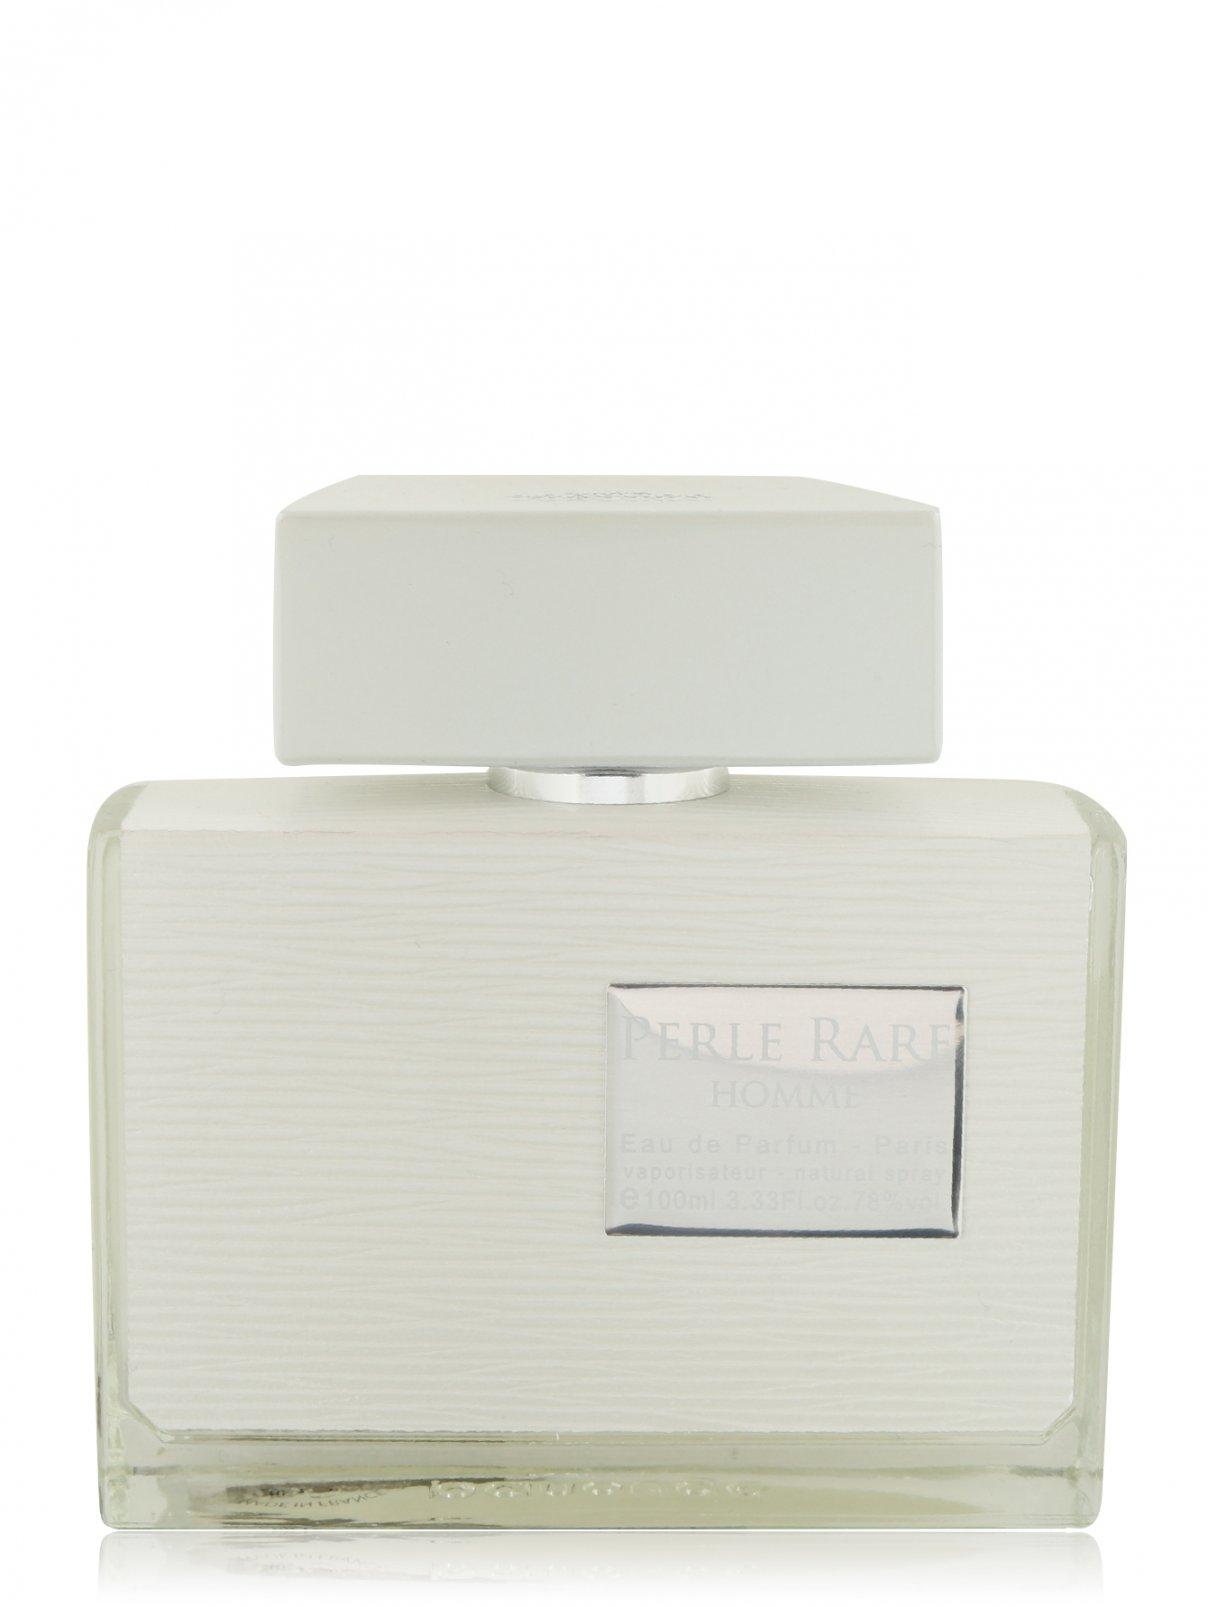 Парфюмерная вода 100 мл Perle Rare Homme White Panouge  –  Общий вид